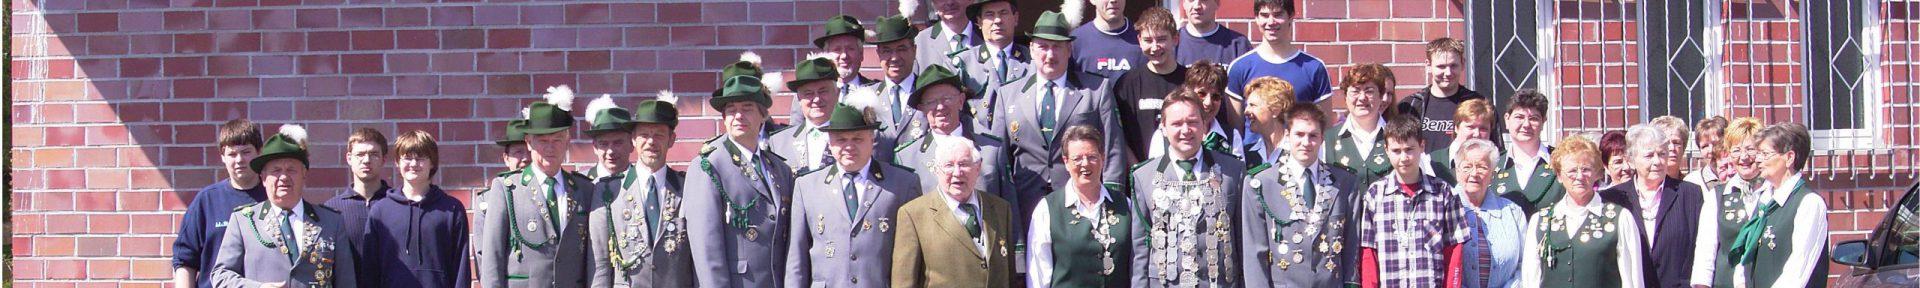 Schützen-Club Moringen e.V.